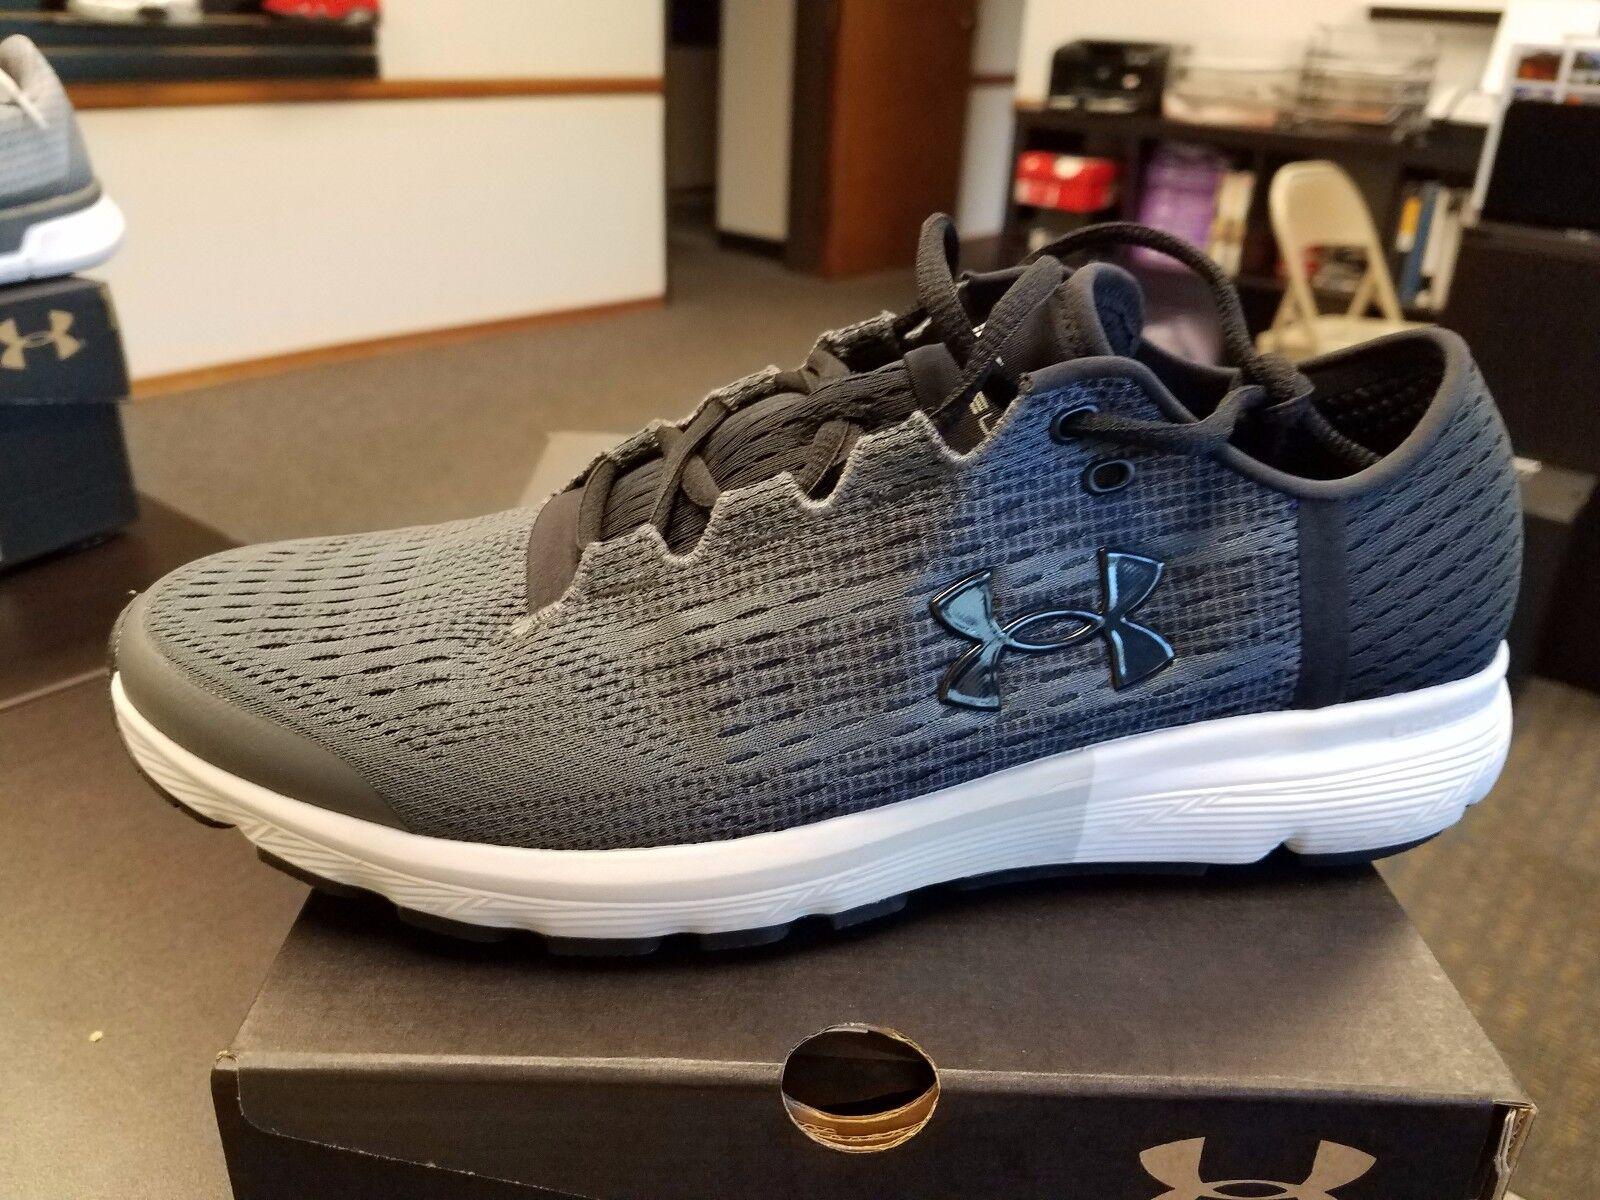 Brand New Under Armour Uomo SpeedForm Velociti Running Shoes, 1285680-076 GREY